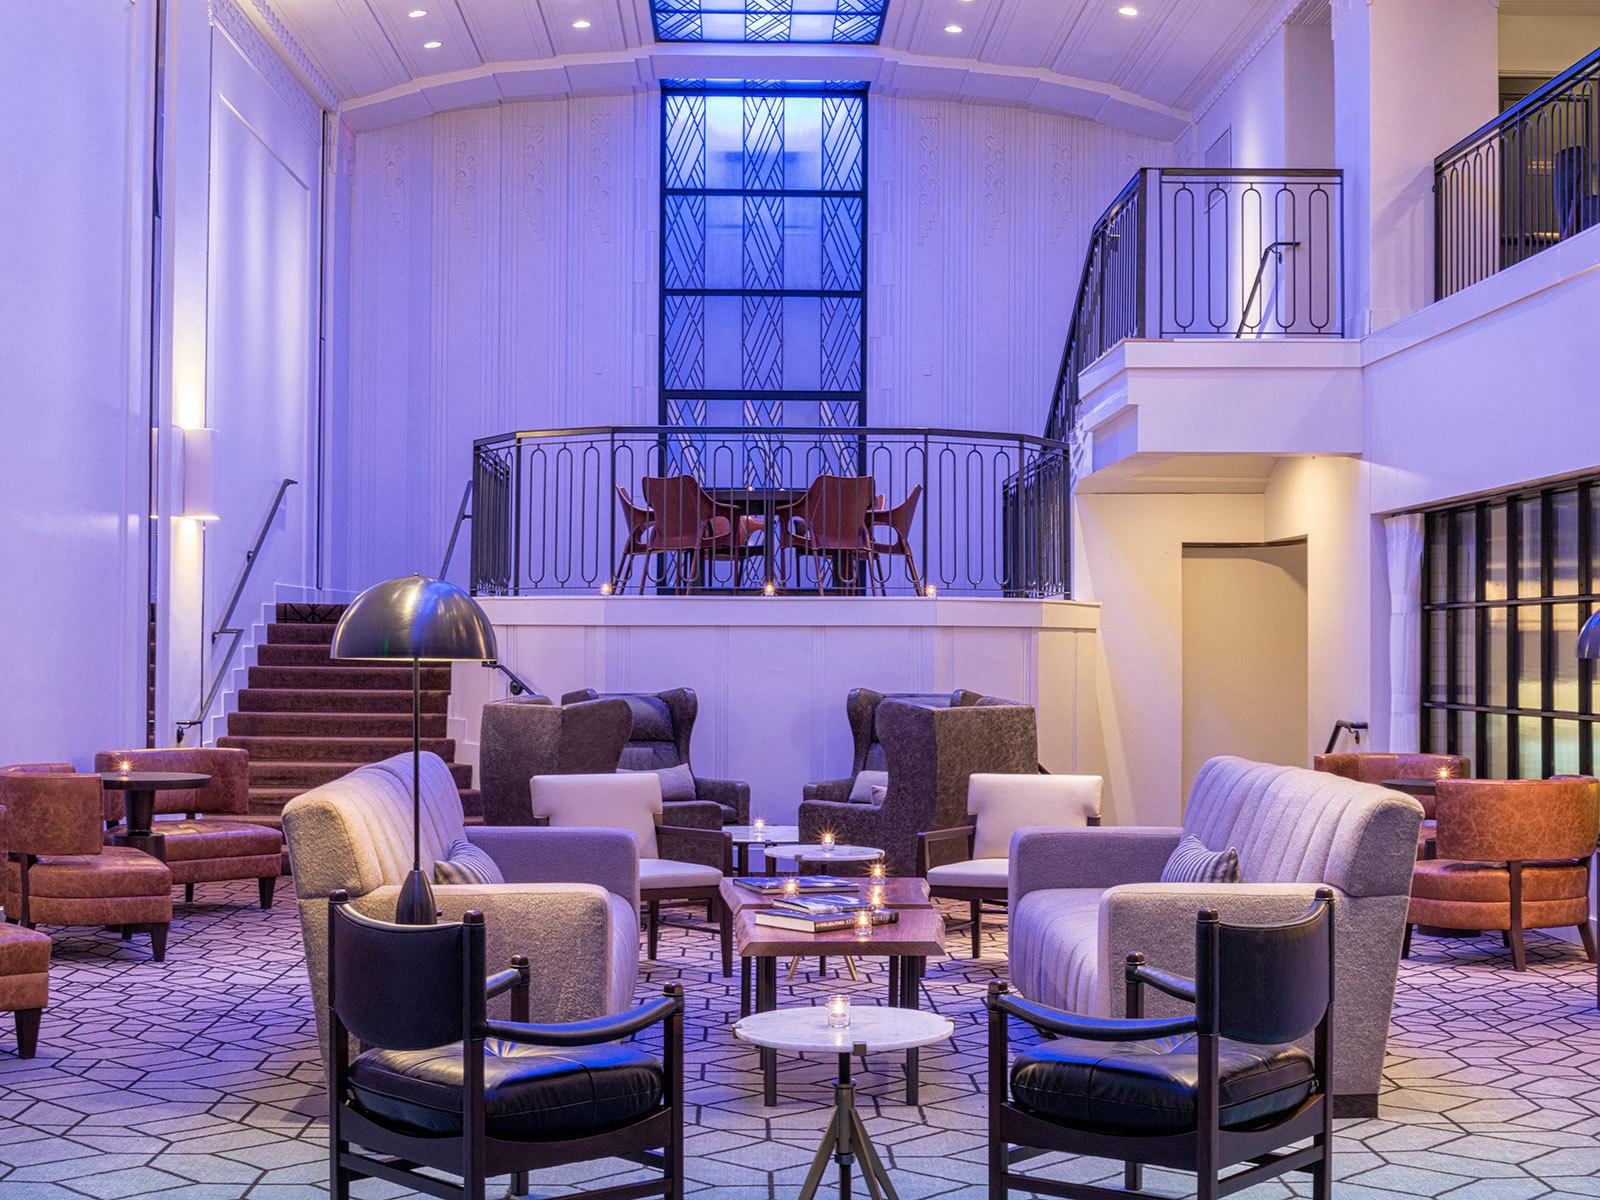 Hotel-Theodore-Seattle-atrium.jpg?mtime=20180808143756#asset:102811